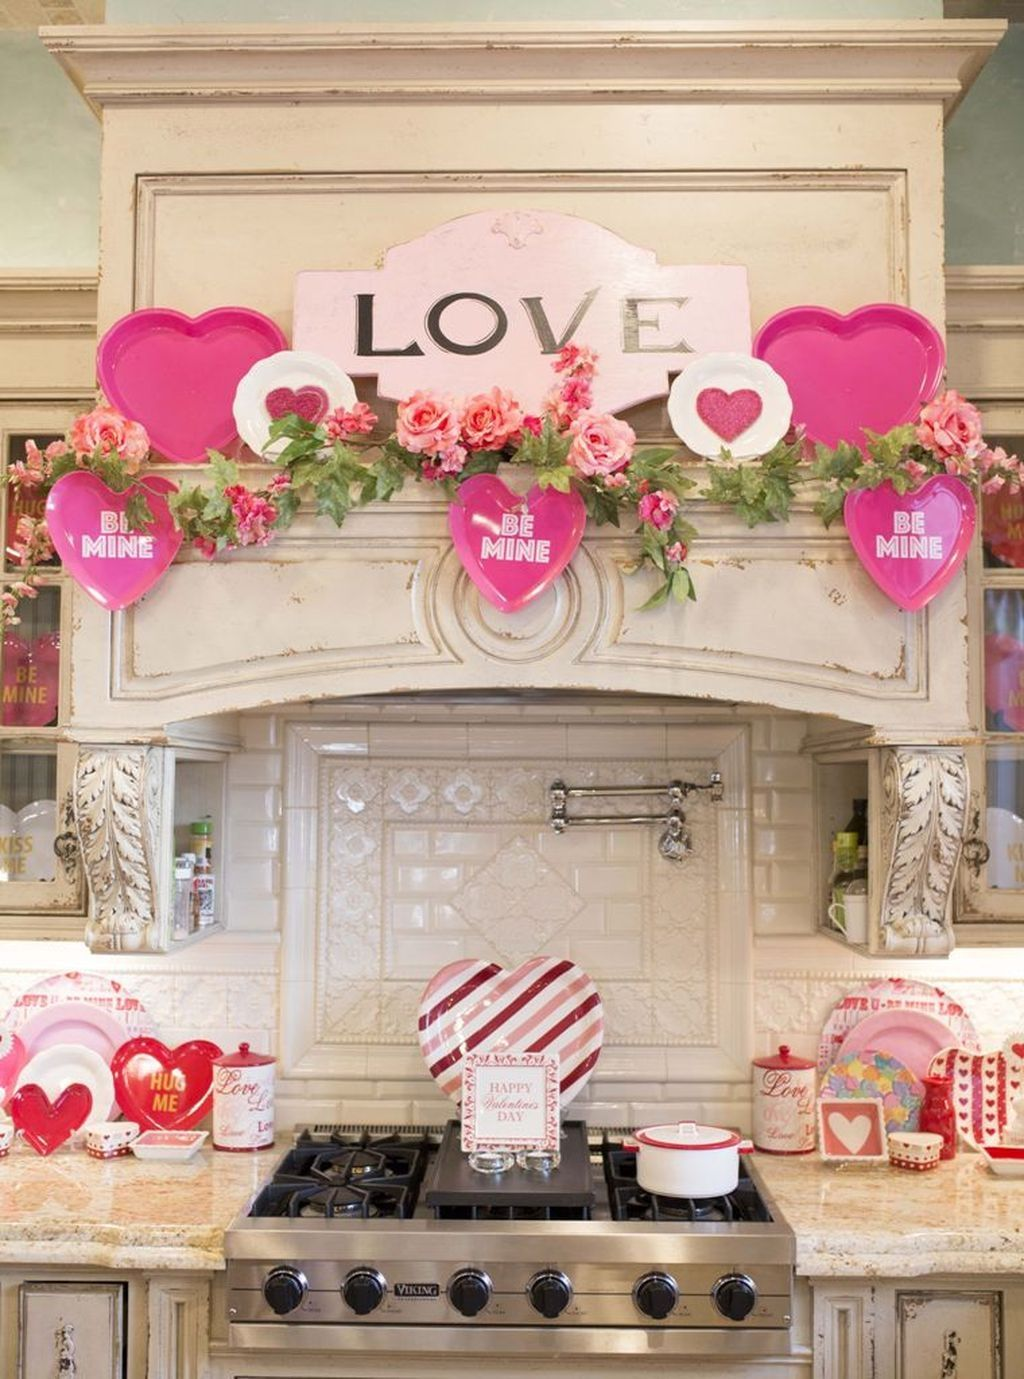 48 Rustic Romantic Decorating Ideas For Valentines Day | Diy ...